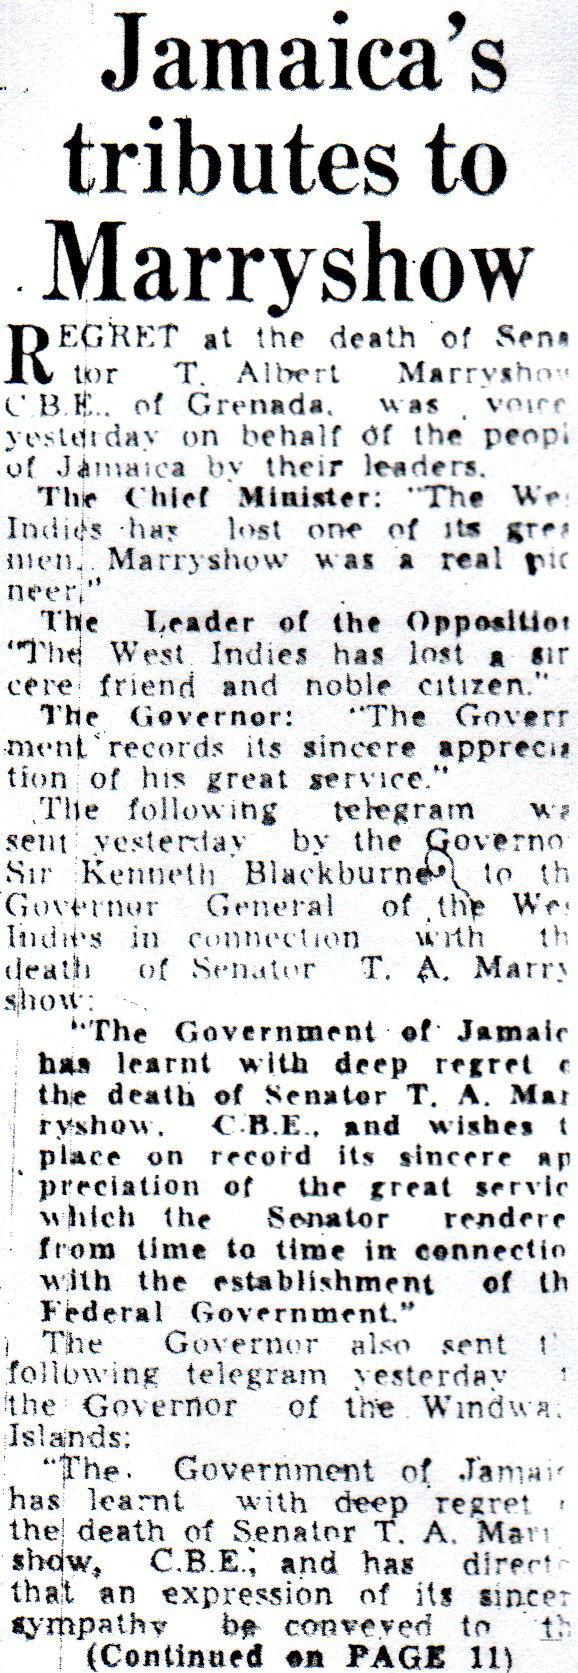 JamaicasTributesToMarryshow21Oct1958-1_1